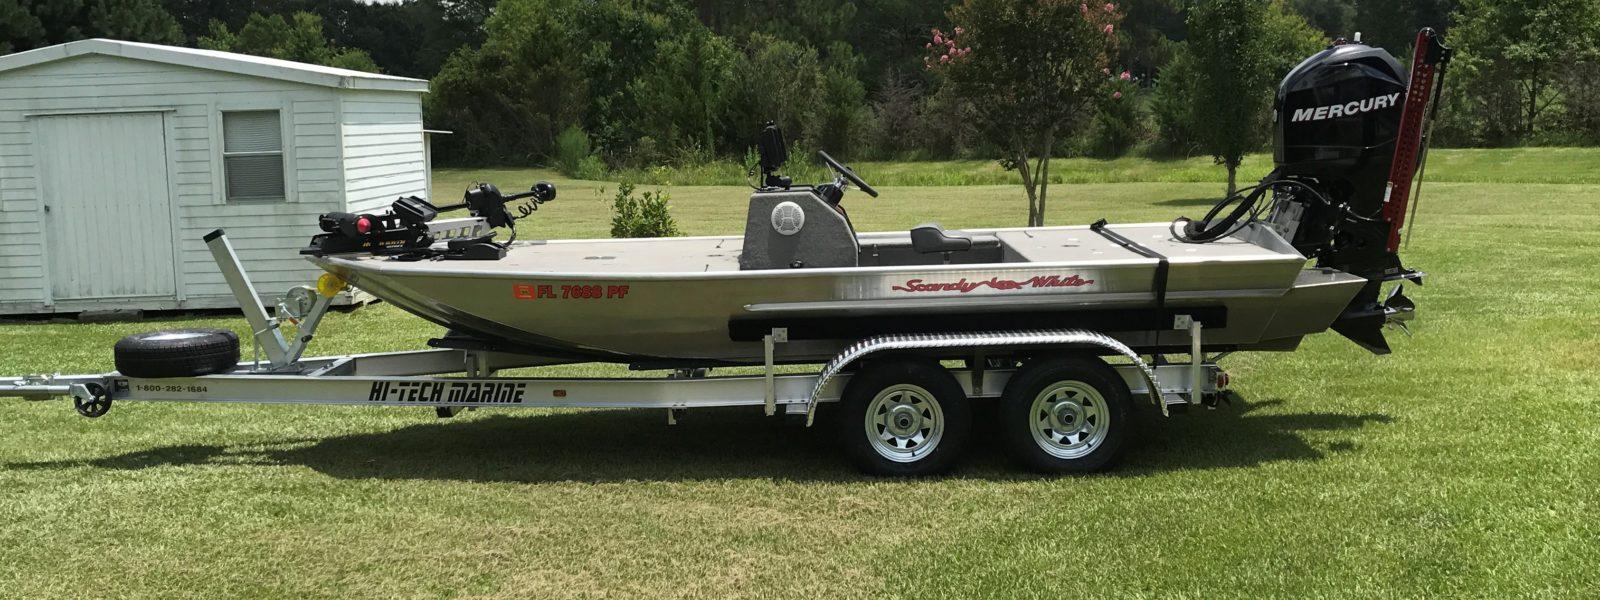 Scandy White Boat